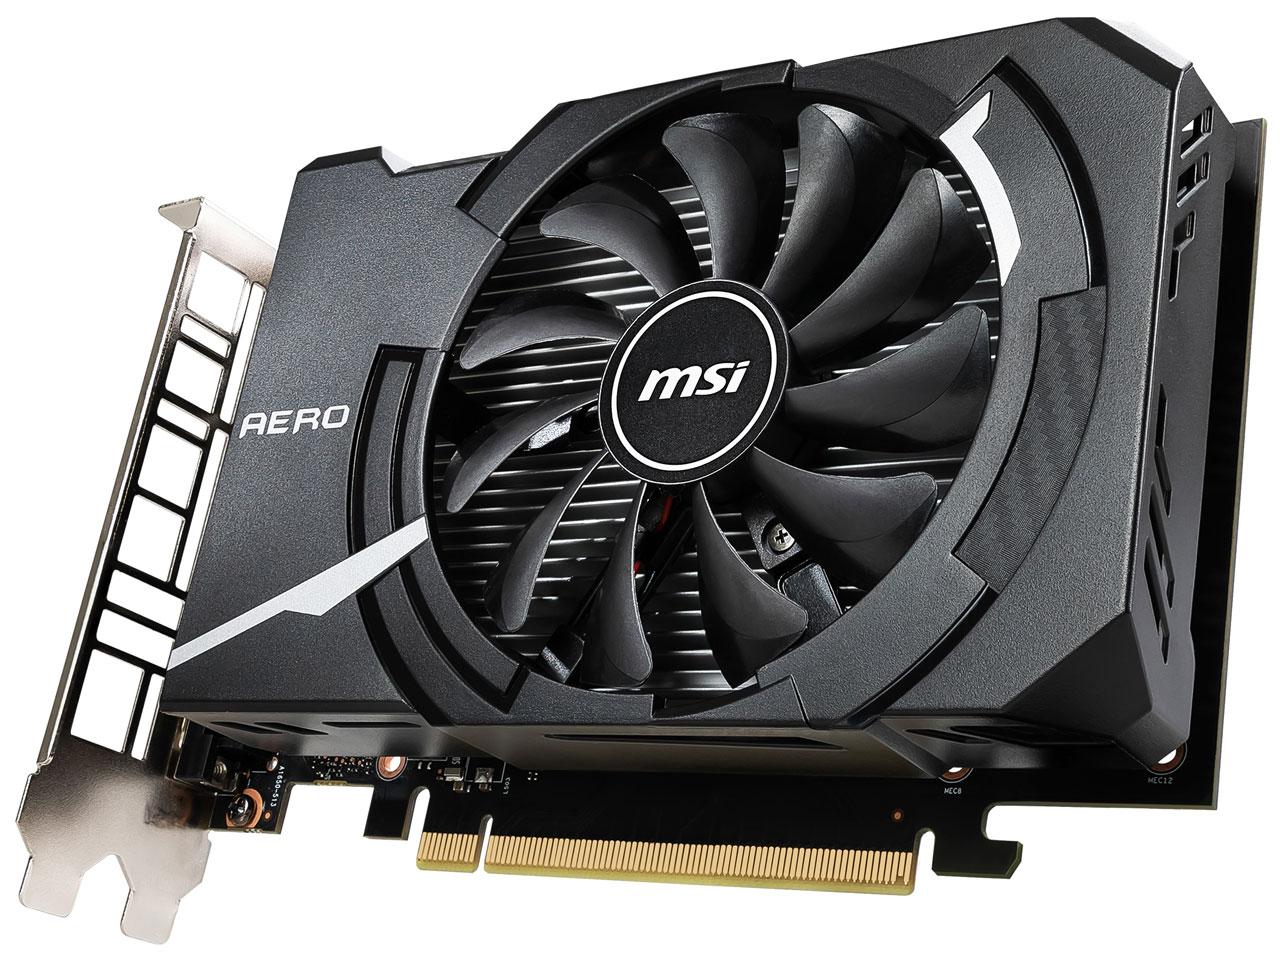 『本体2』 GeForce GTX 1650 AERO ITX 4G OC [PCIExp 4GB] の製品画像